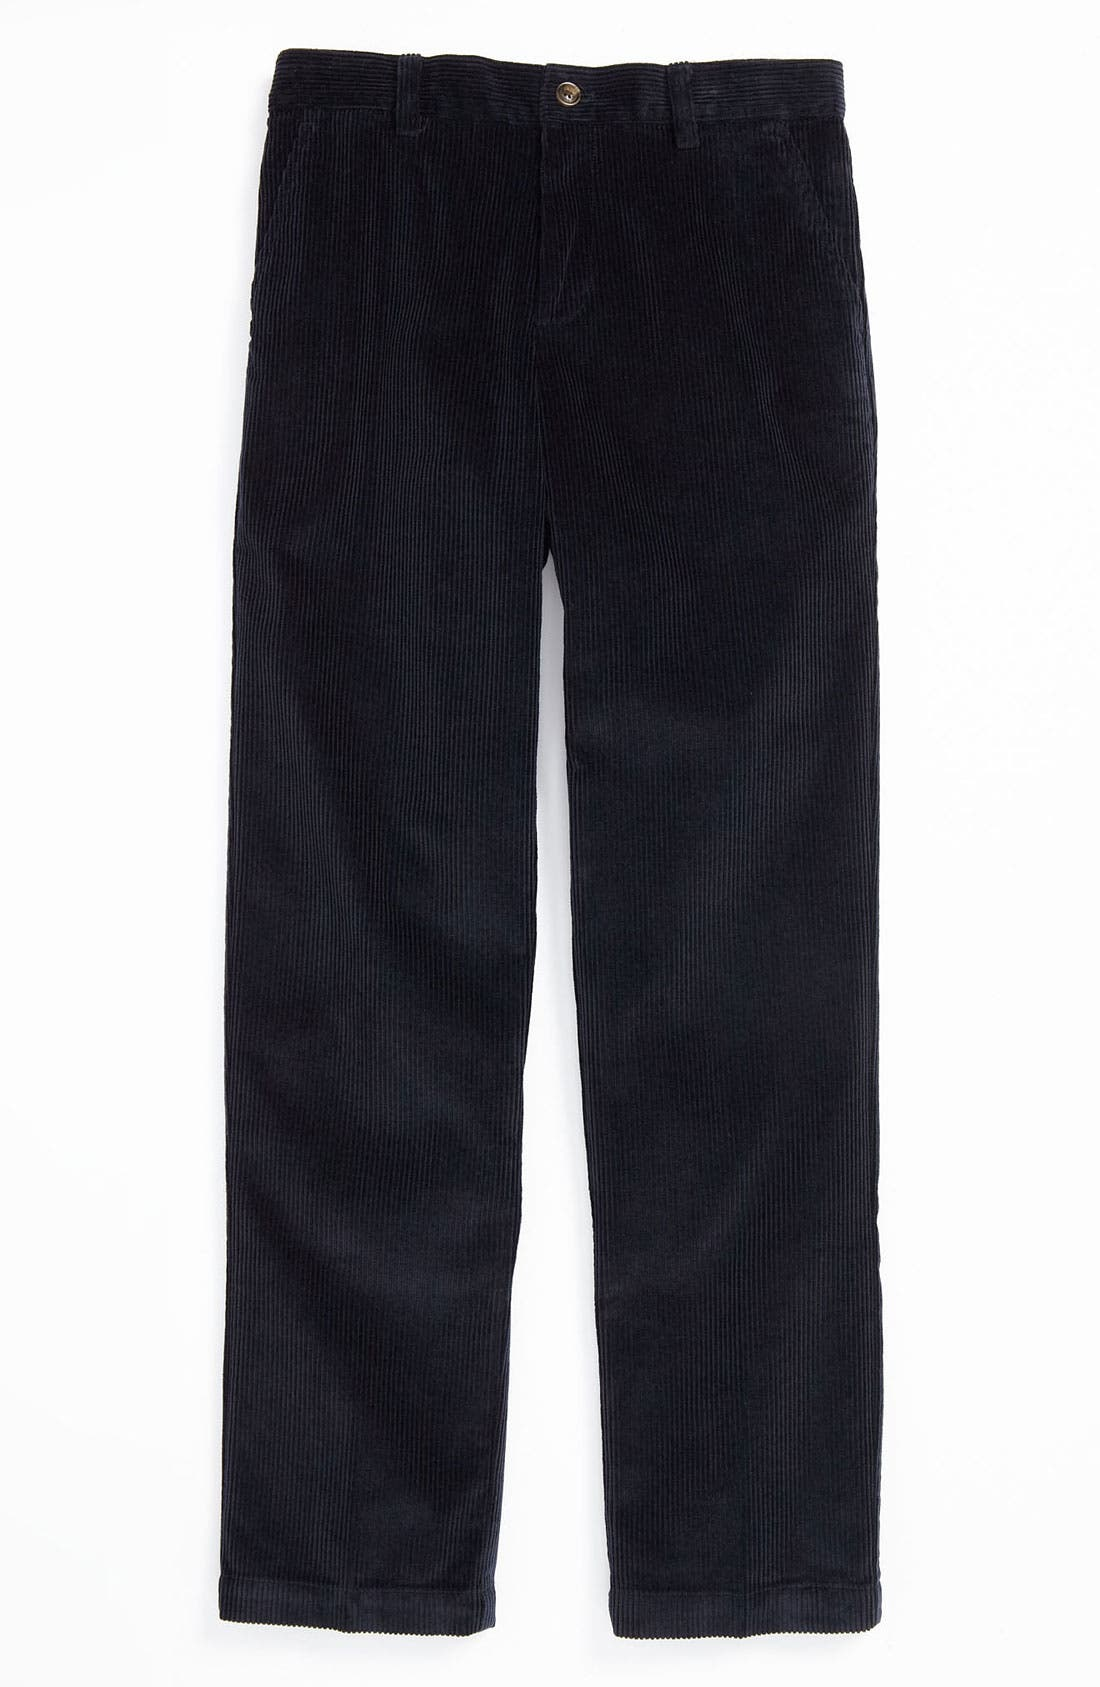 Main Image - Brooks Brothers Wide Wale Corduroy Pants (Big Boys)